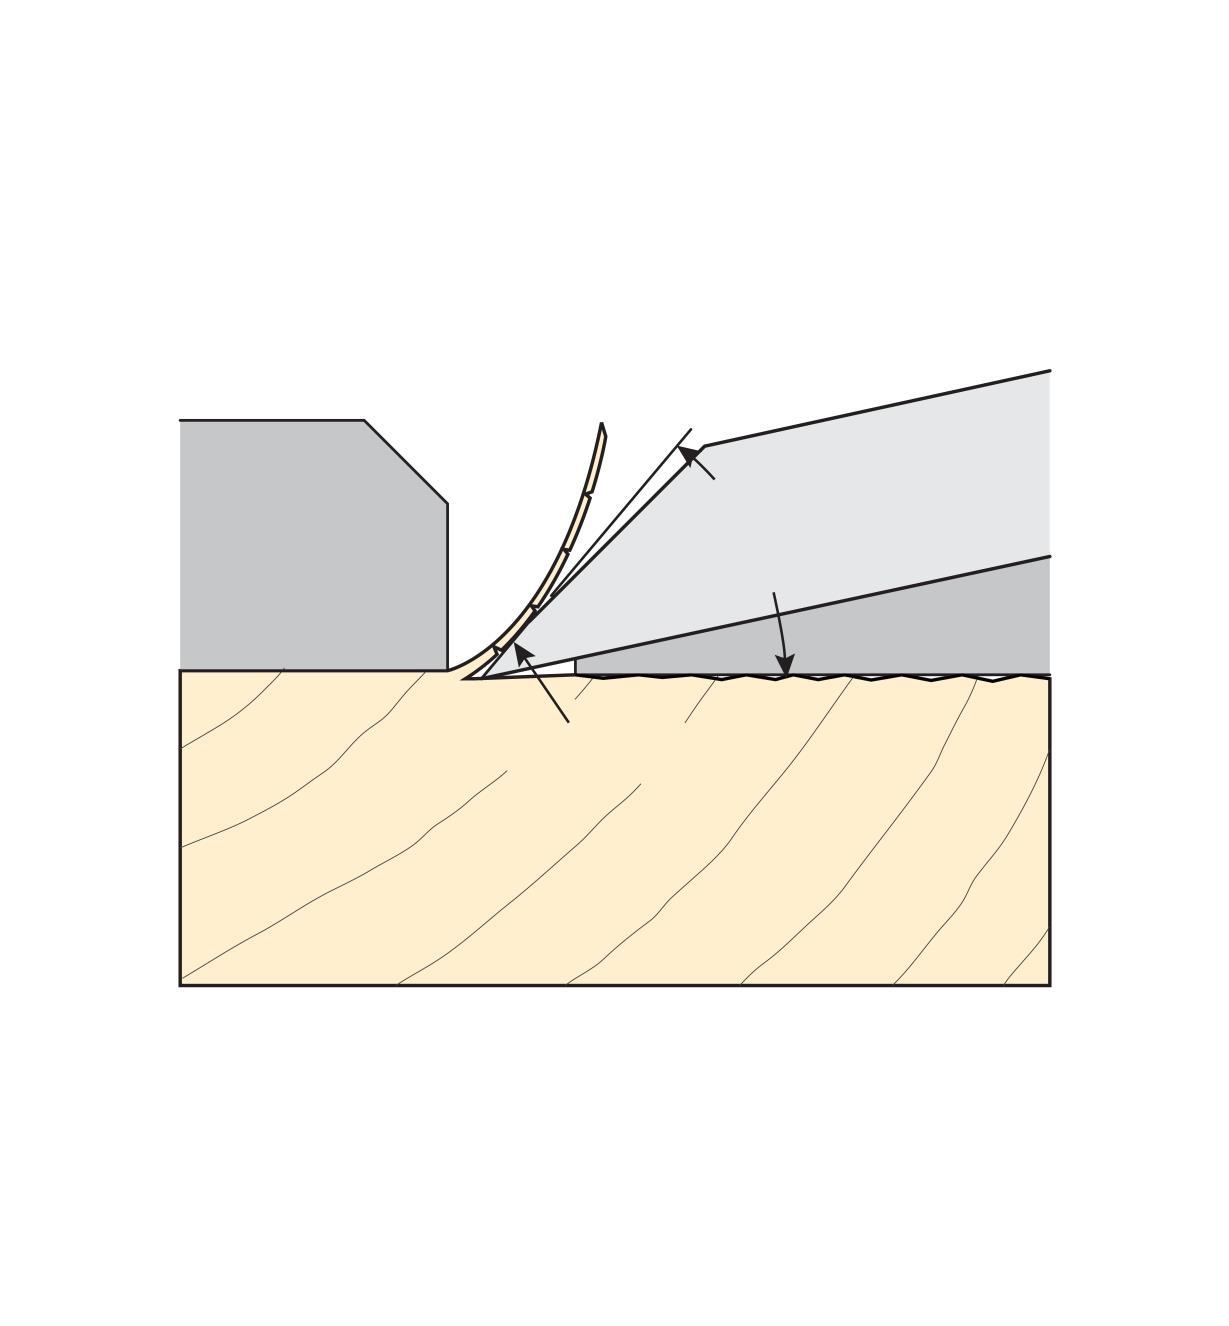 Veritas Low-Angle Jack Plane